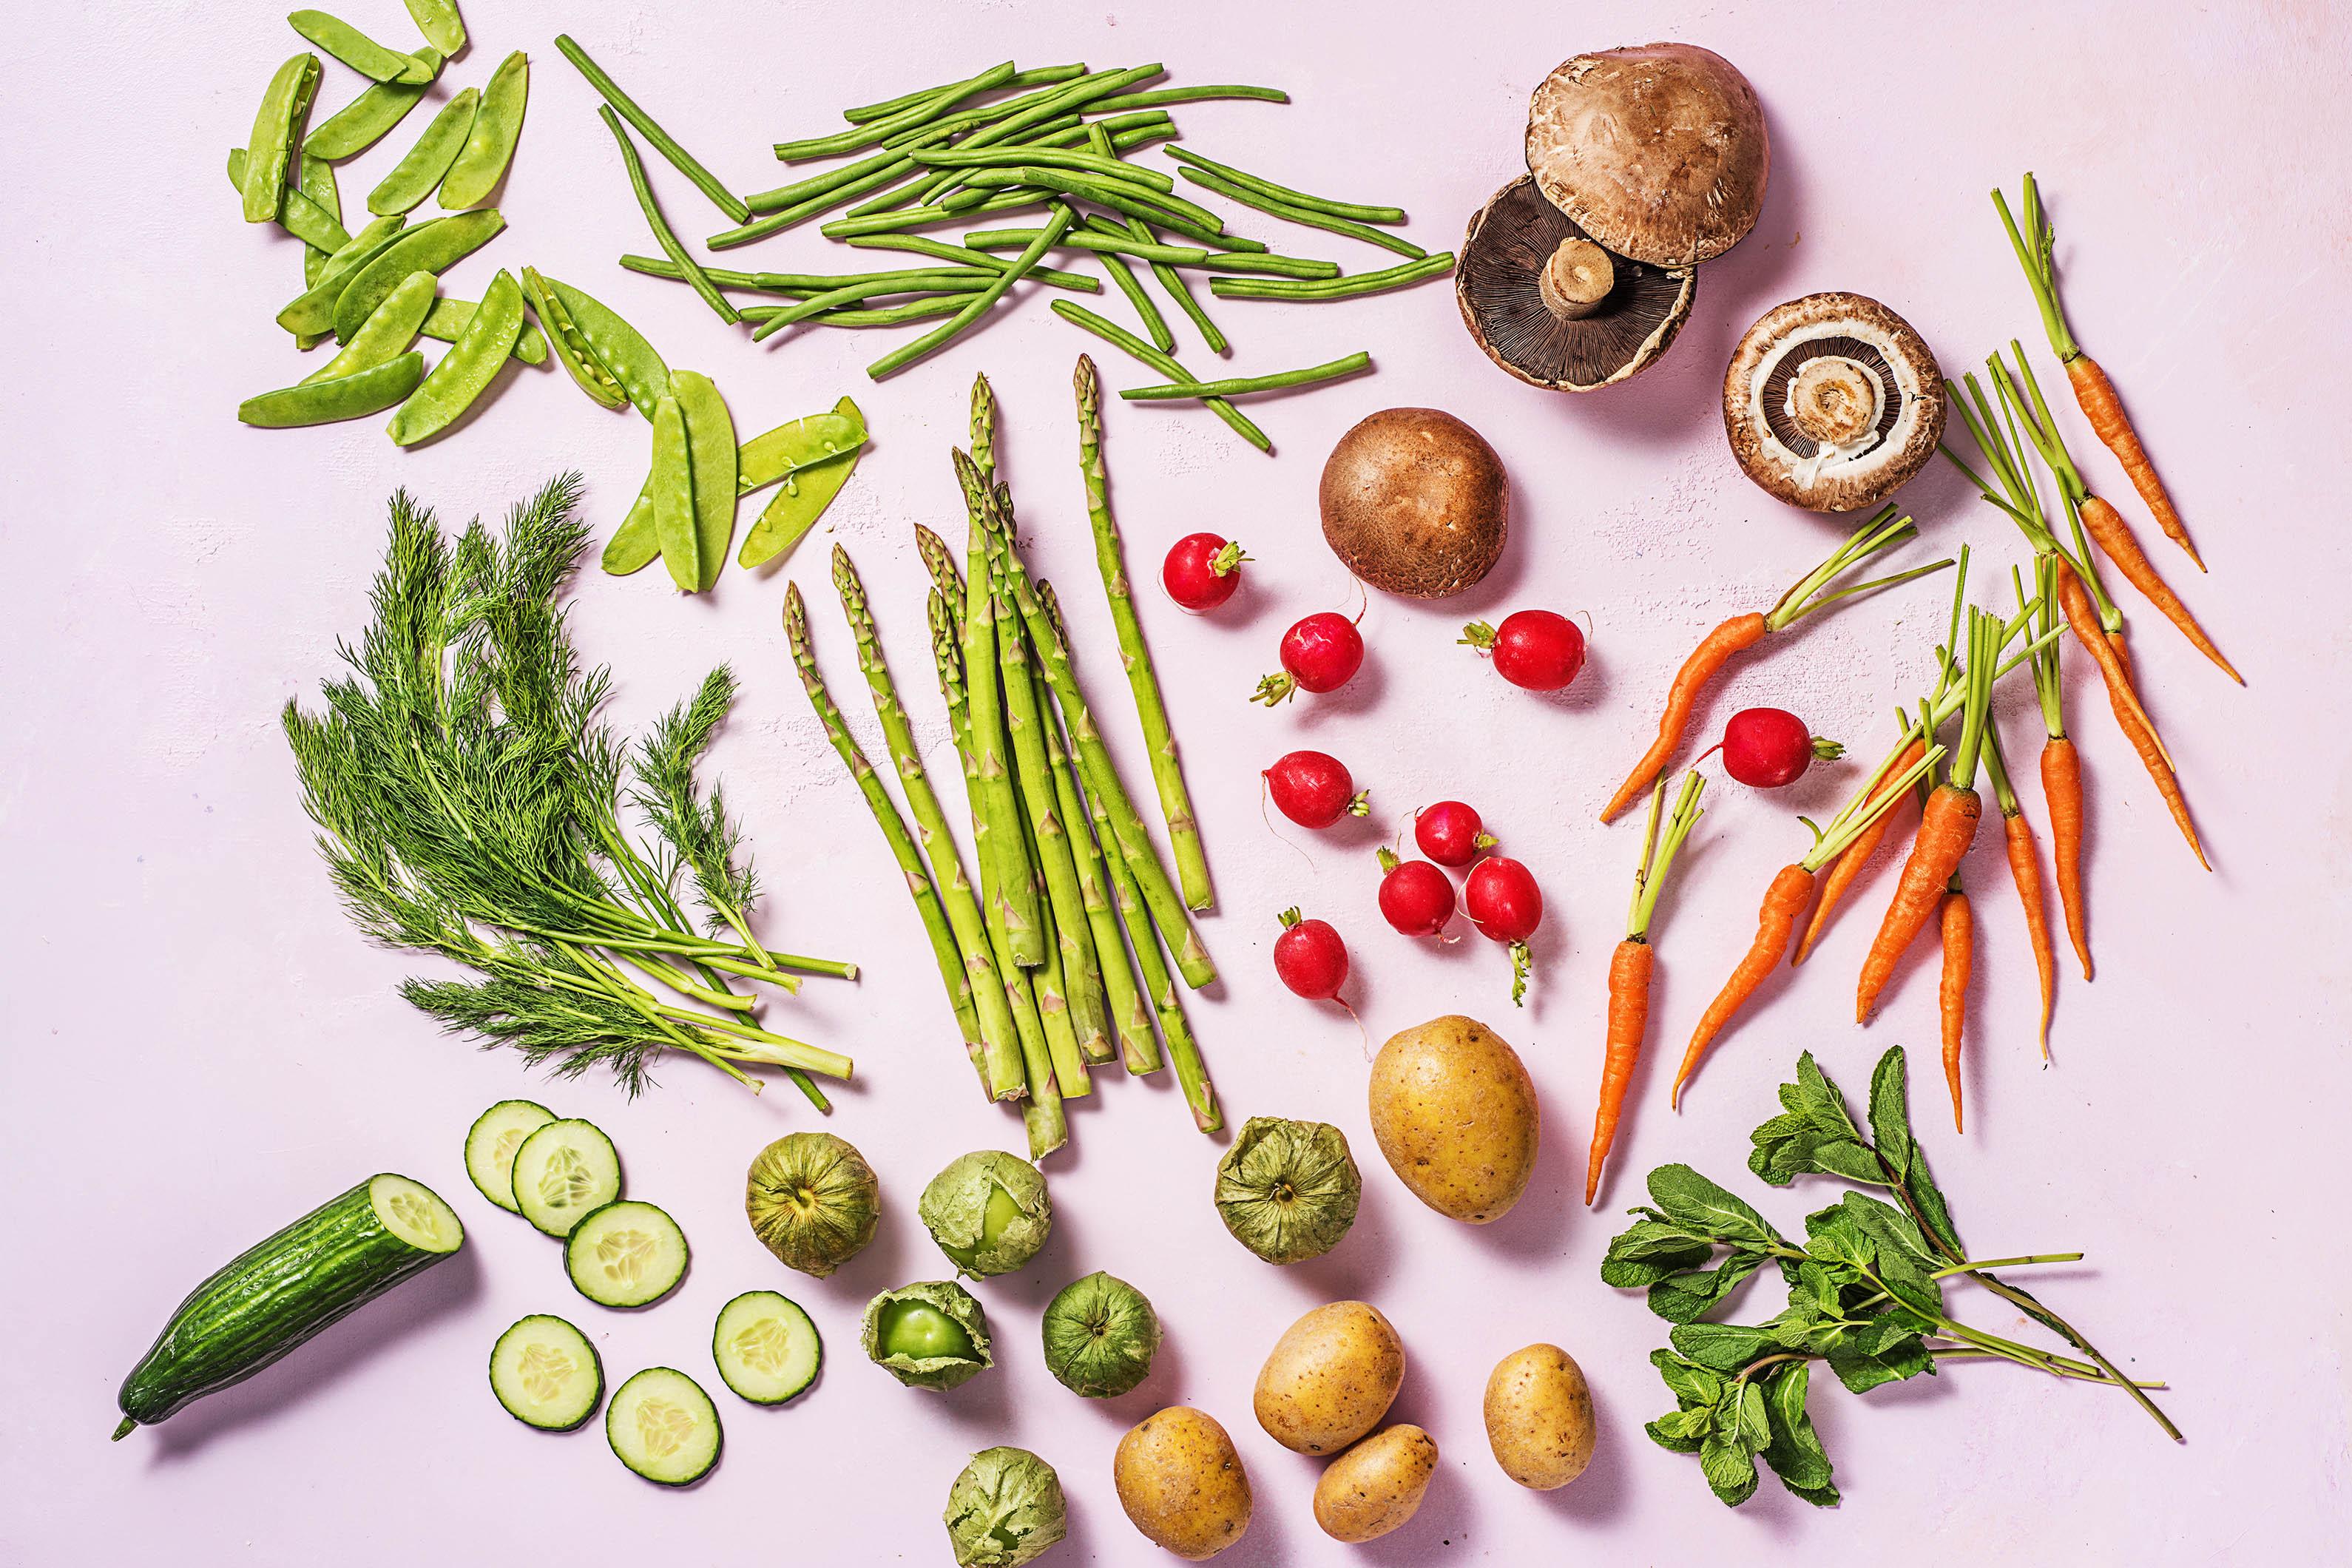 cooking hacks-HelloFresh-freezing-veggies